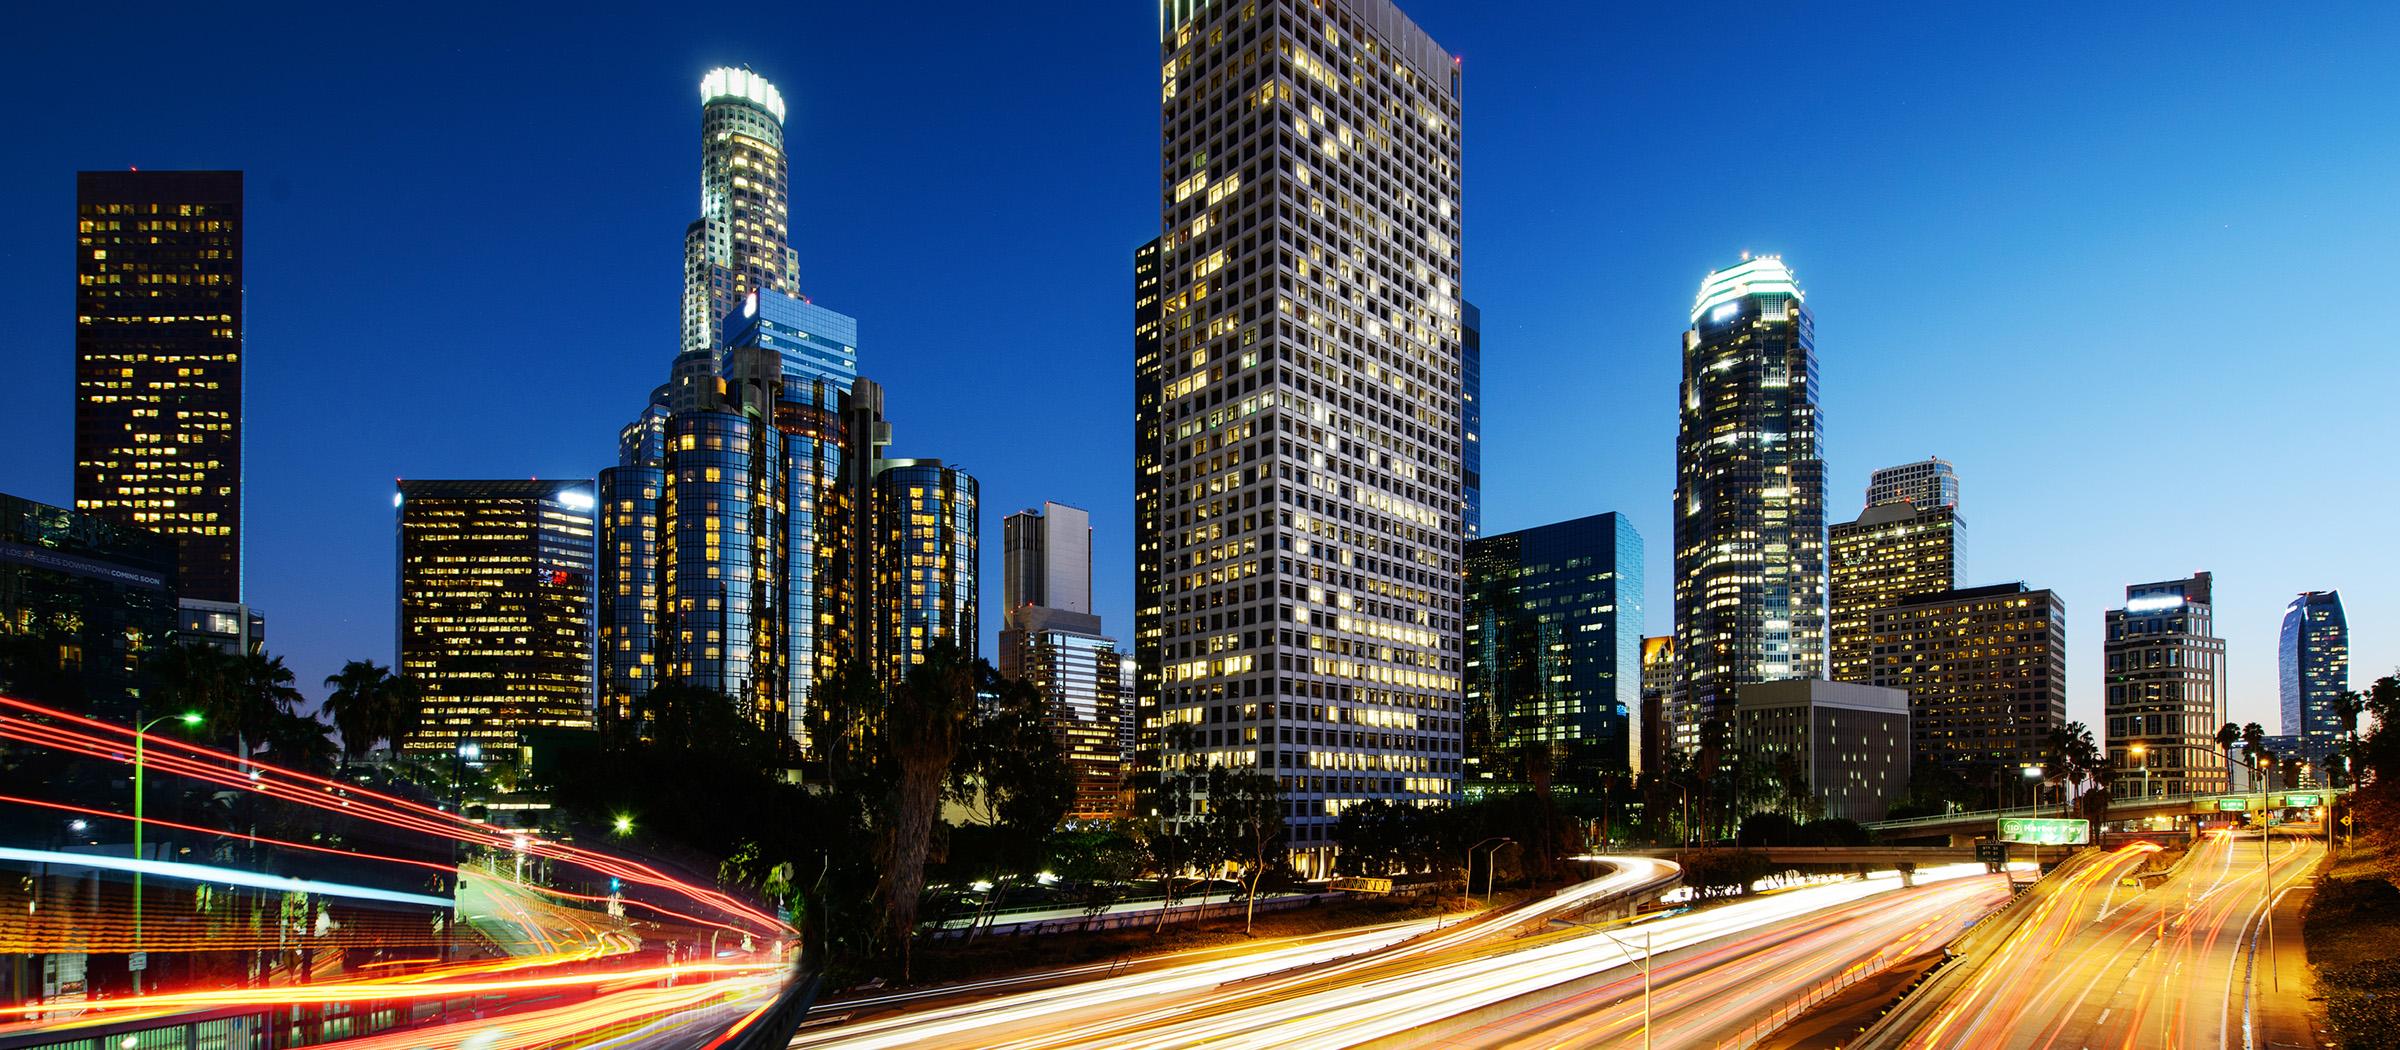 Los Angeles speed lights.jpg